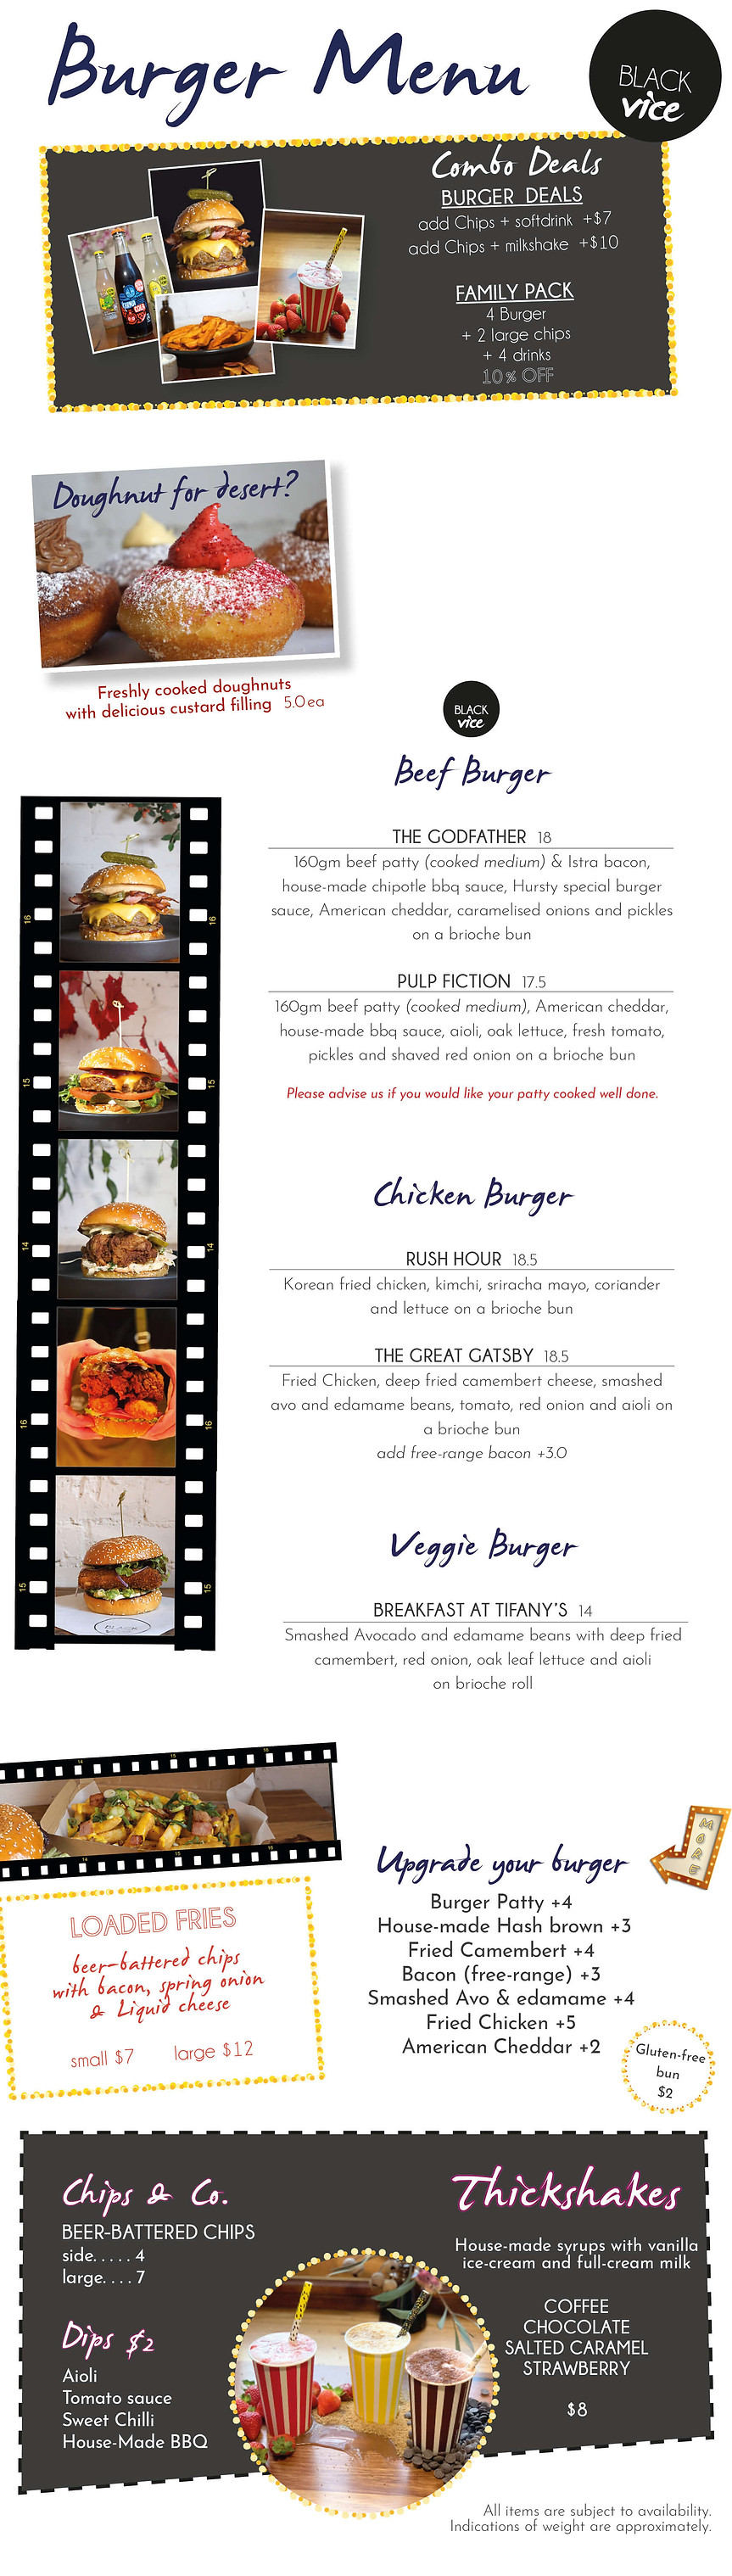 Burger-menu_website_200729_s.jpg